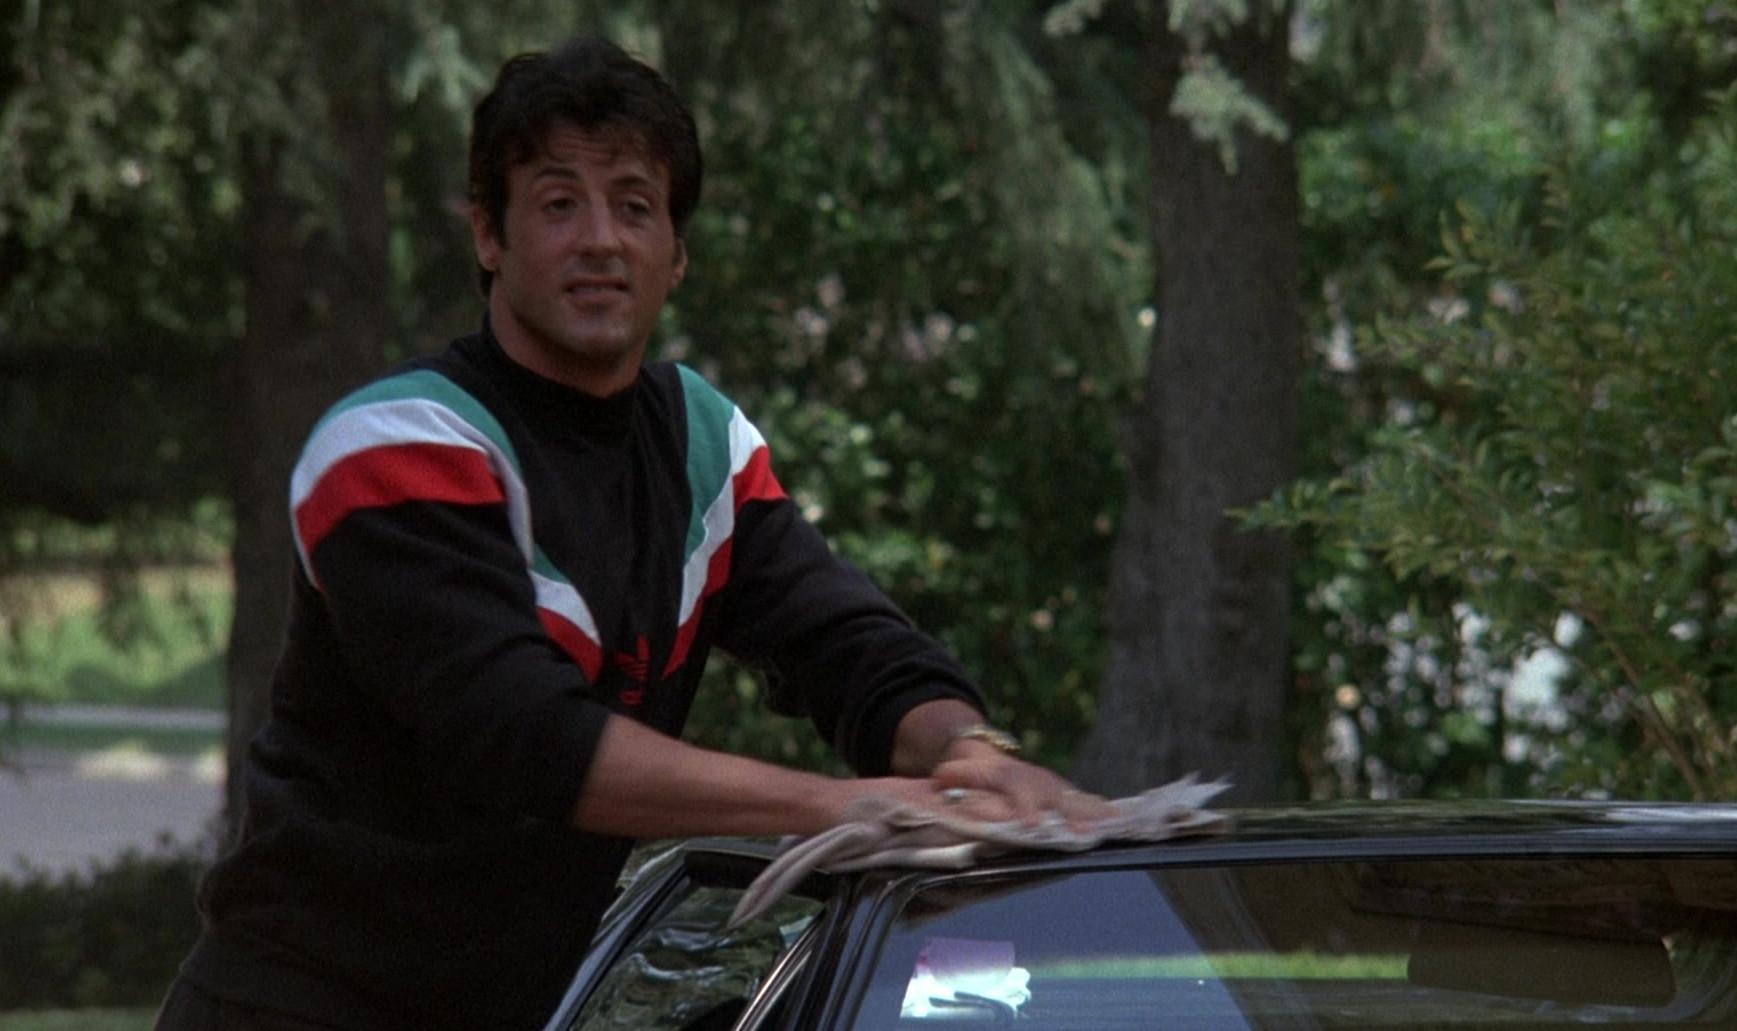 Sportswear Trainers 80s Films Main Rocky IV